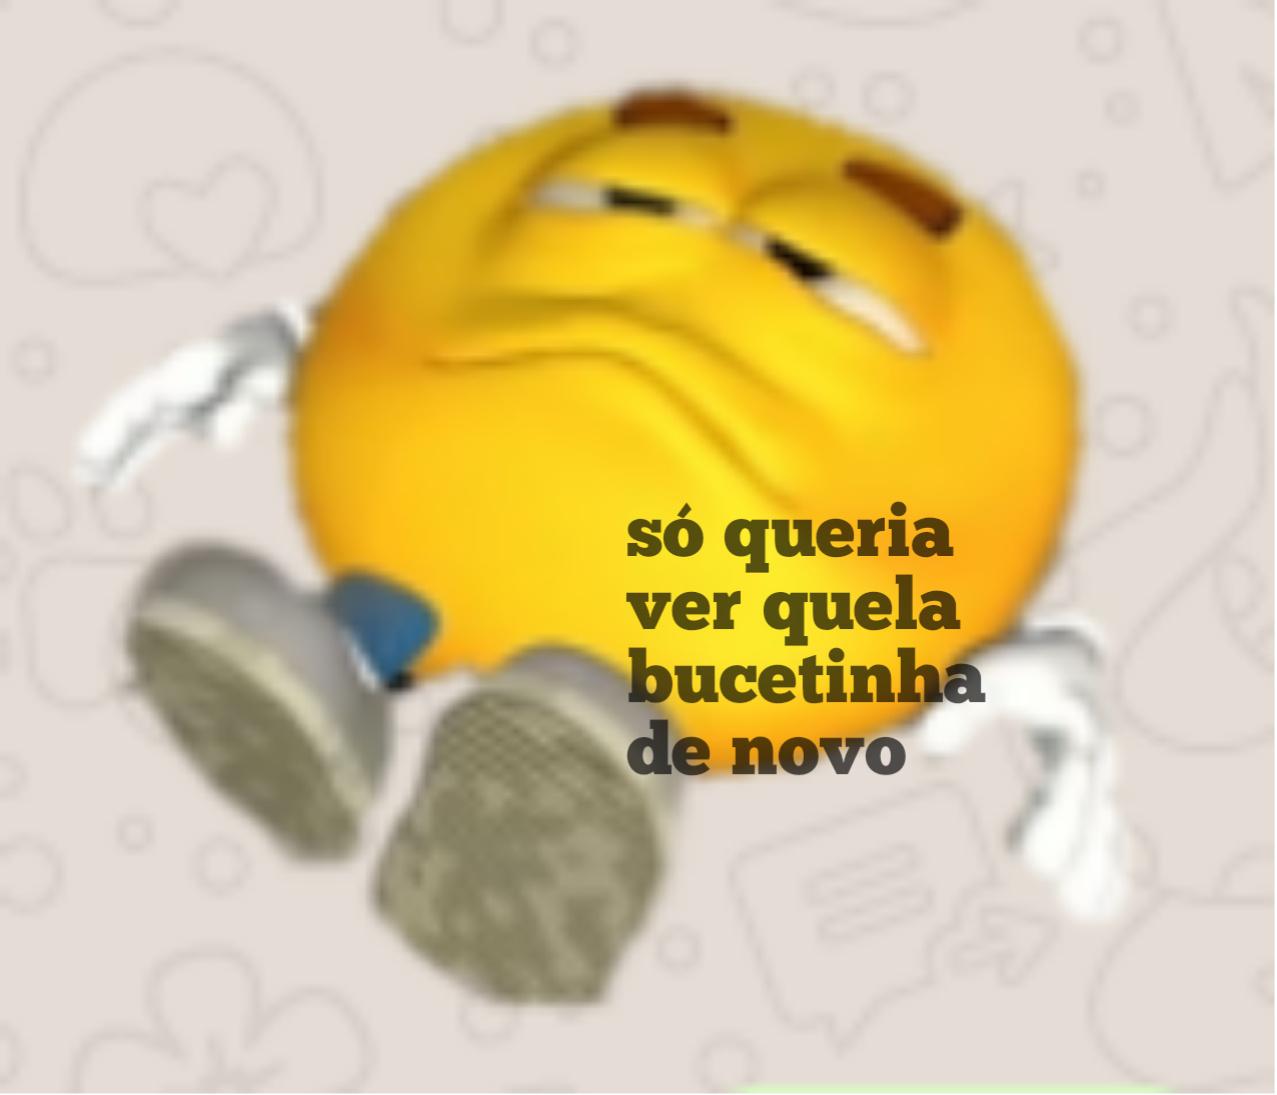 Bucetinha - meme